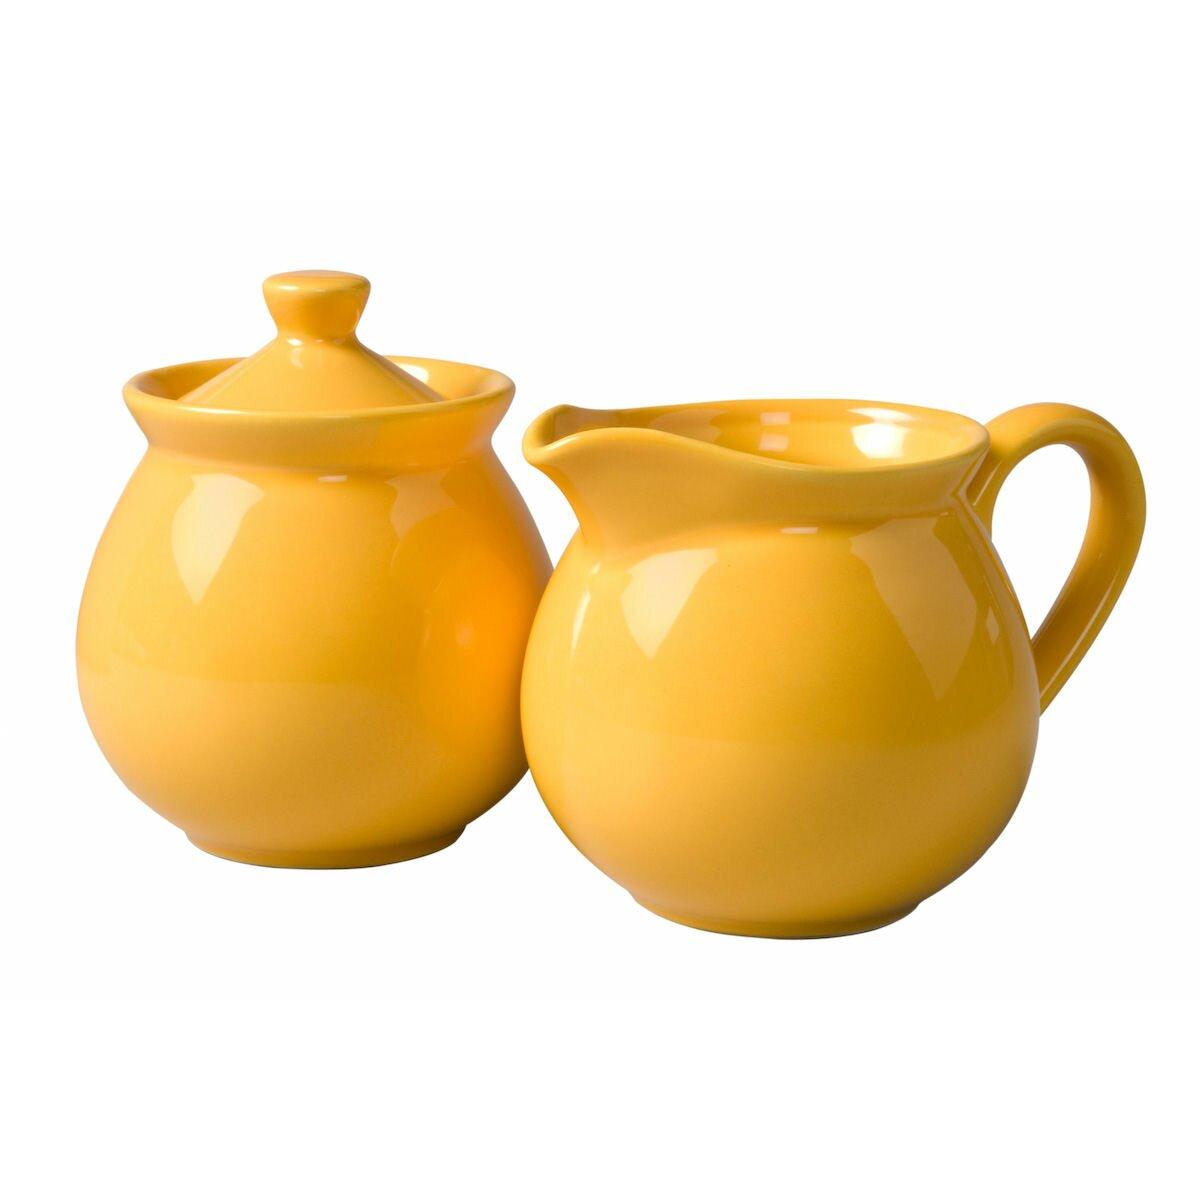 Yellow sugar bowls with lids - Chartridge 2 Piece Sugar Bowl Creamer Set